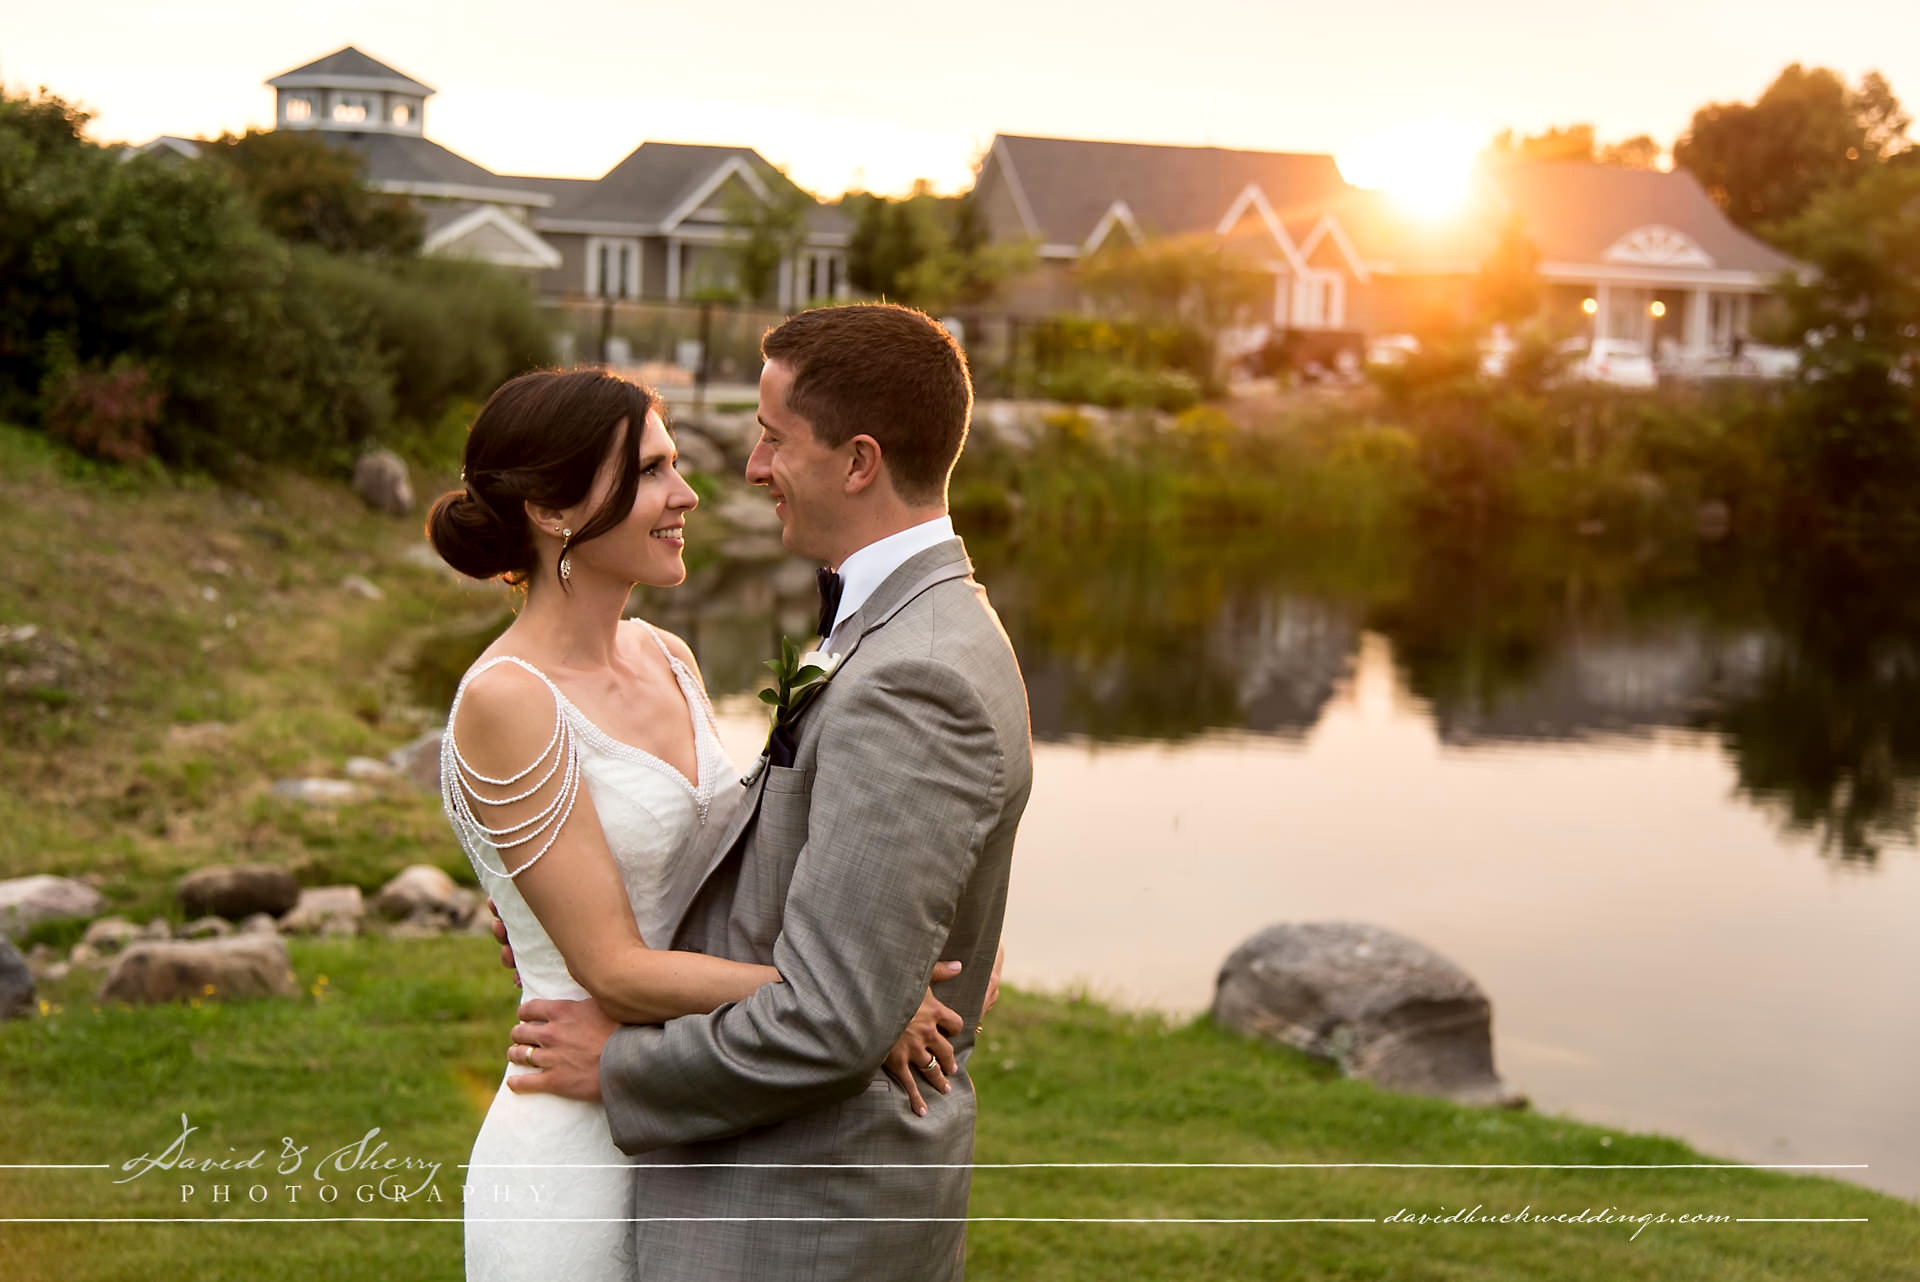 Cobble_Beach_Wedding_Photography_001